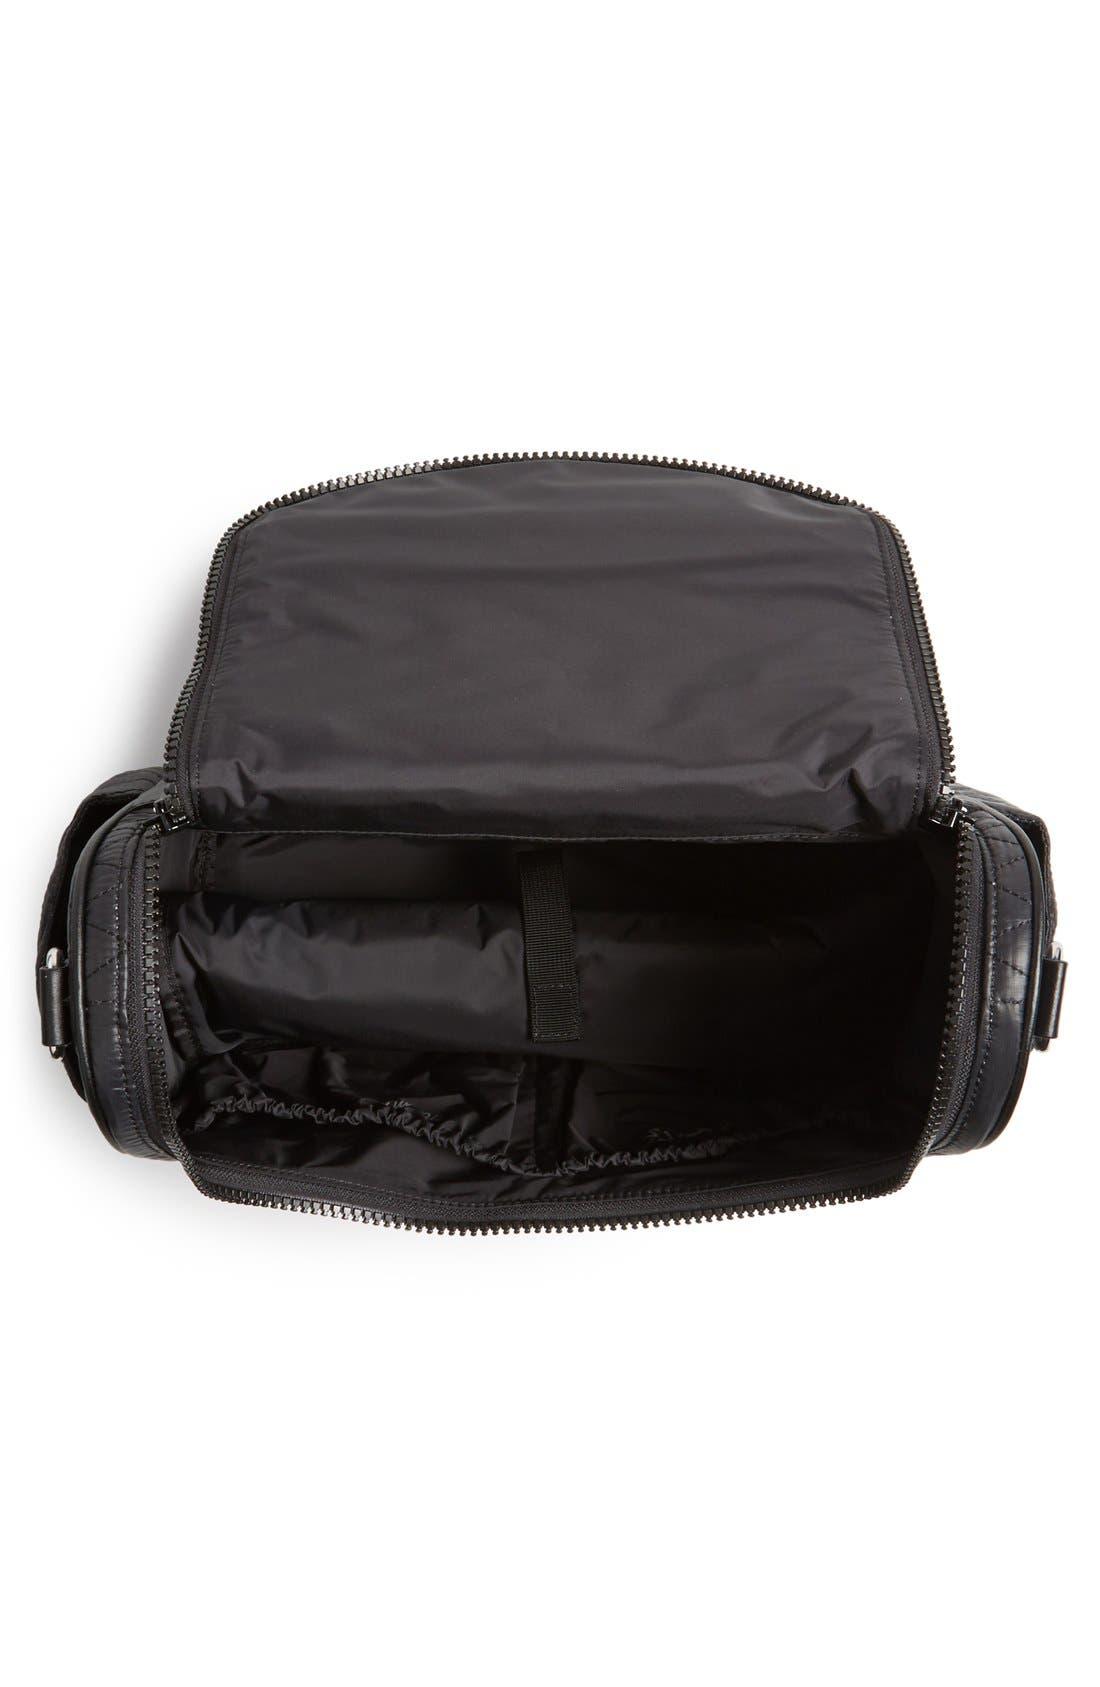 'Jude' Nylon Baby Bag,                             Alternate thumbnail 3, color,                             Black